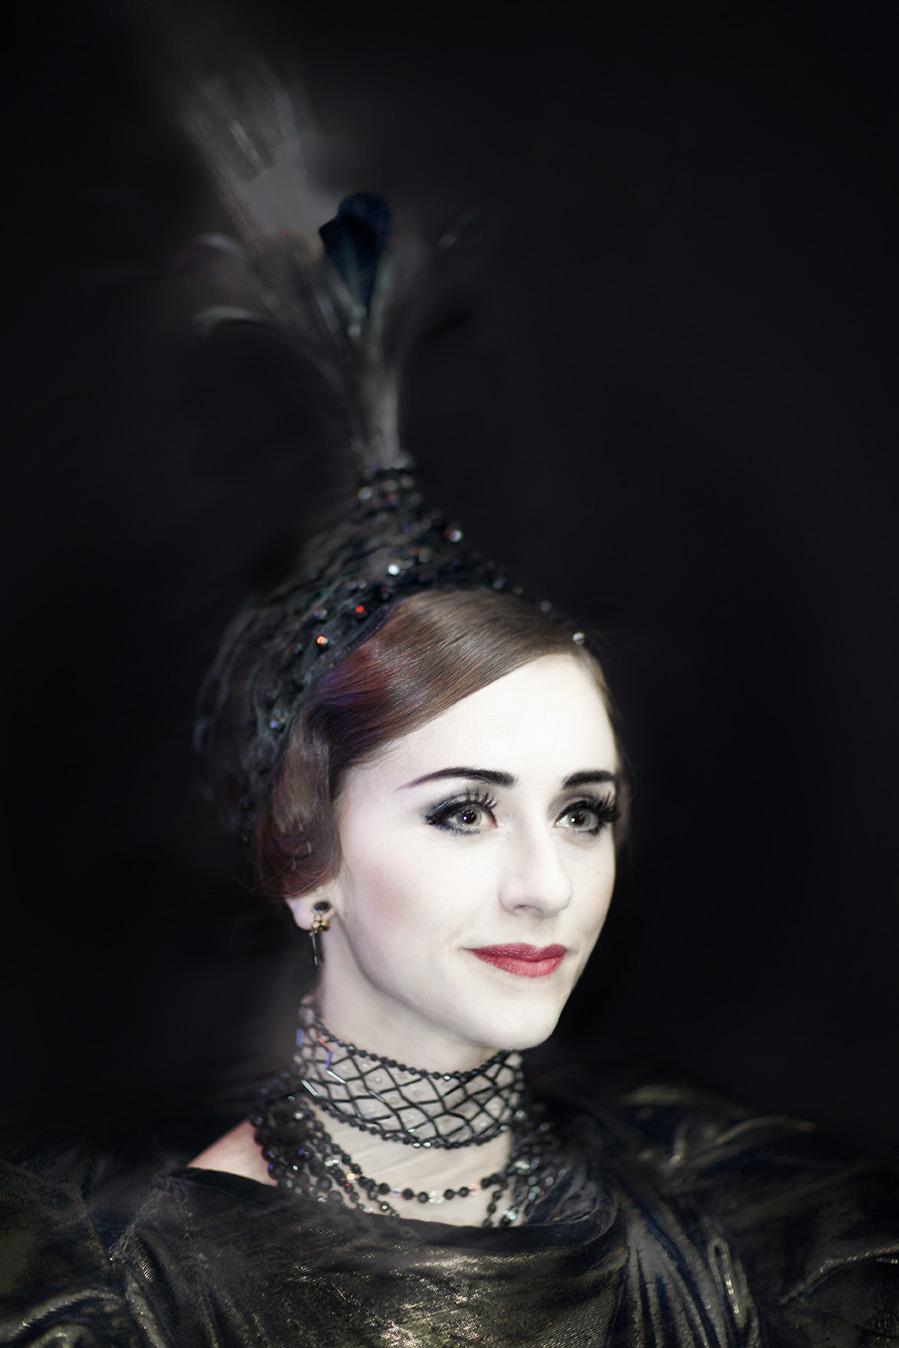 Marianela Nunez as Mathilde Kschessinska